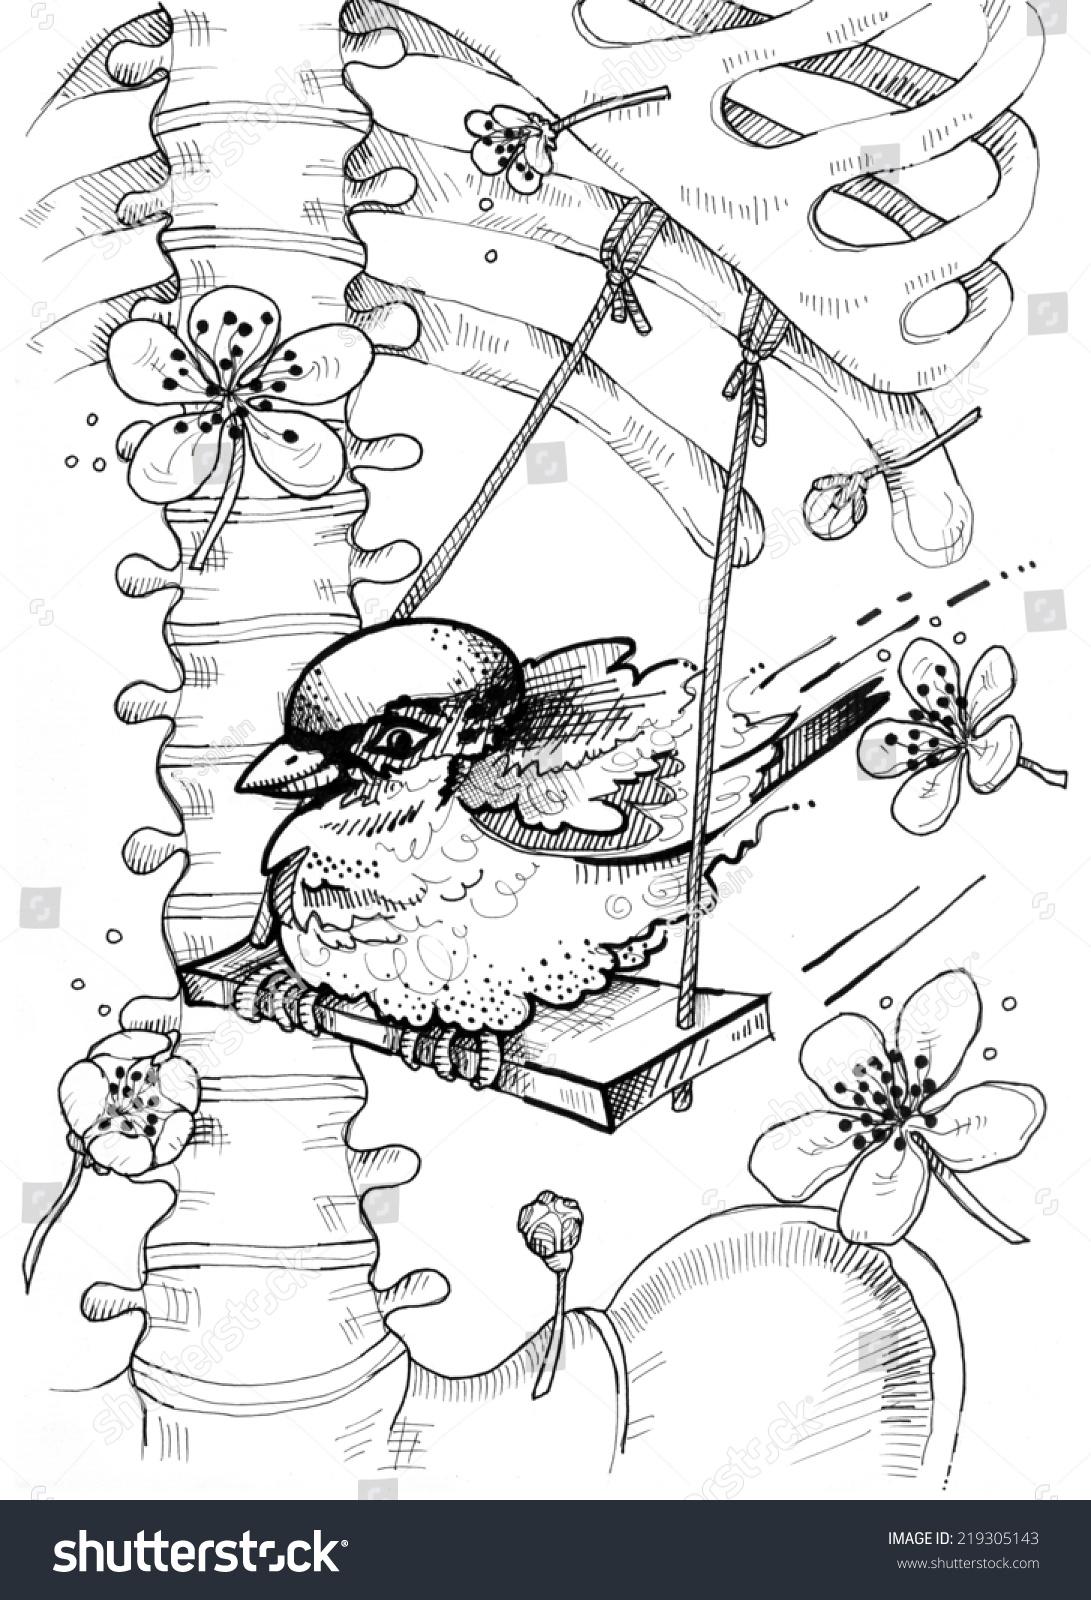 Sparrow Swinging On Ribs Human Anatomy Stock Illustration 219305143